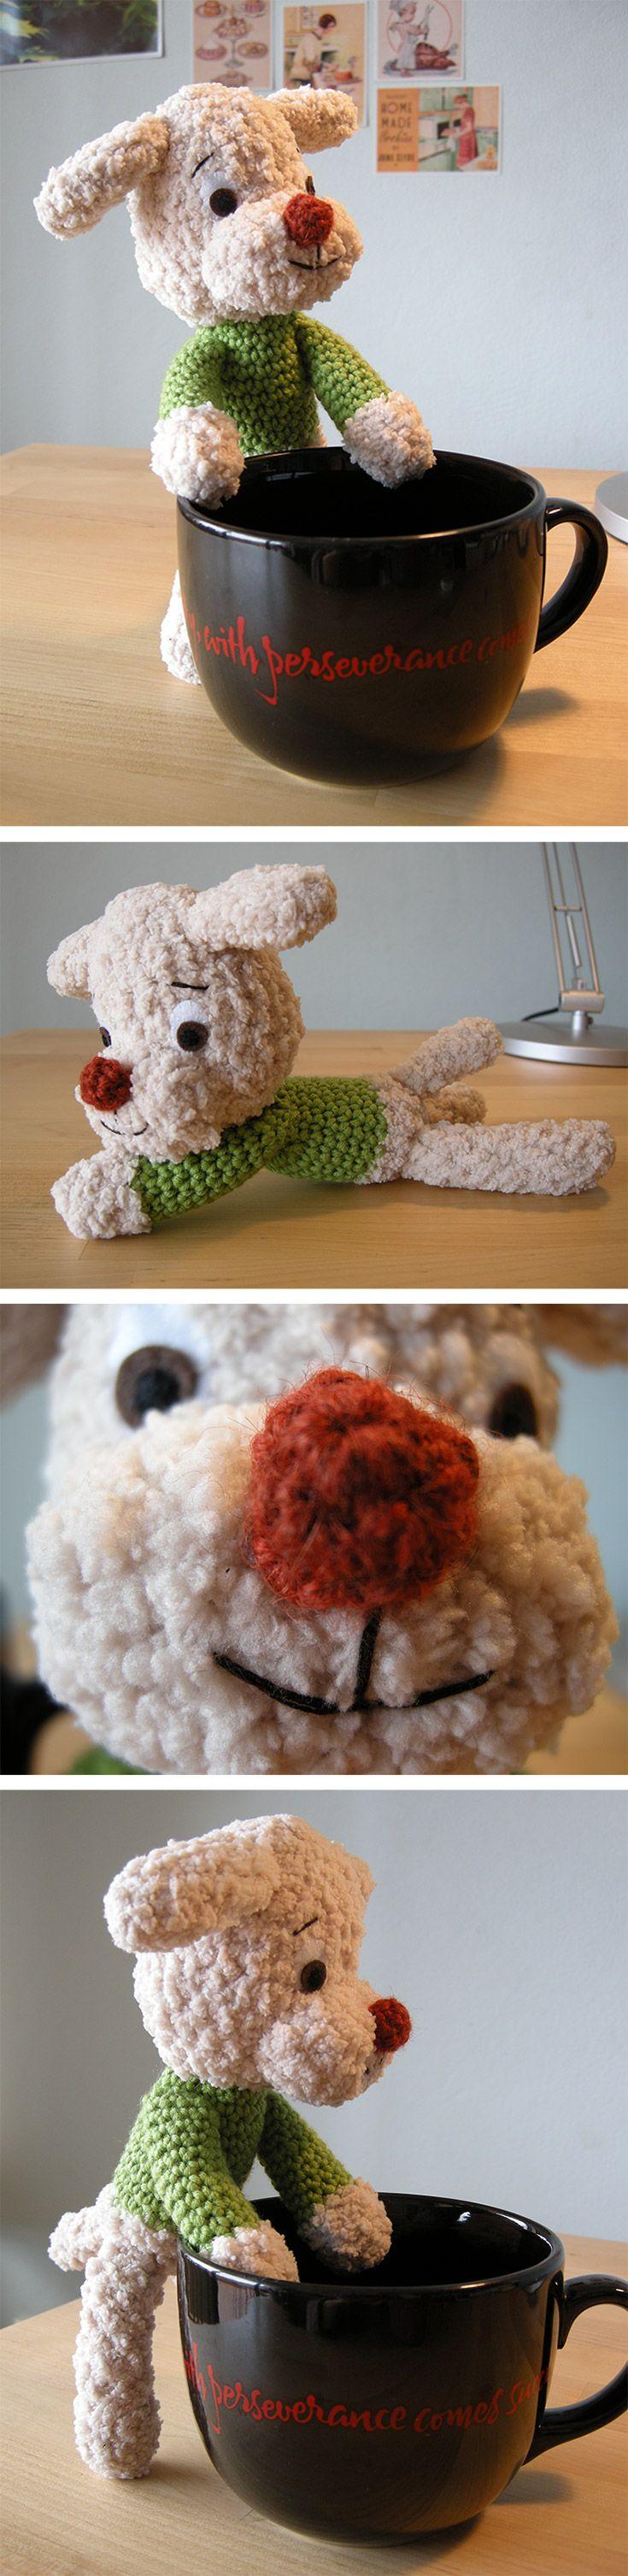 Super cute puppy dog, soft plushie amigurumi. Pattern from a Japanese amigurumi book.